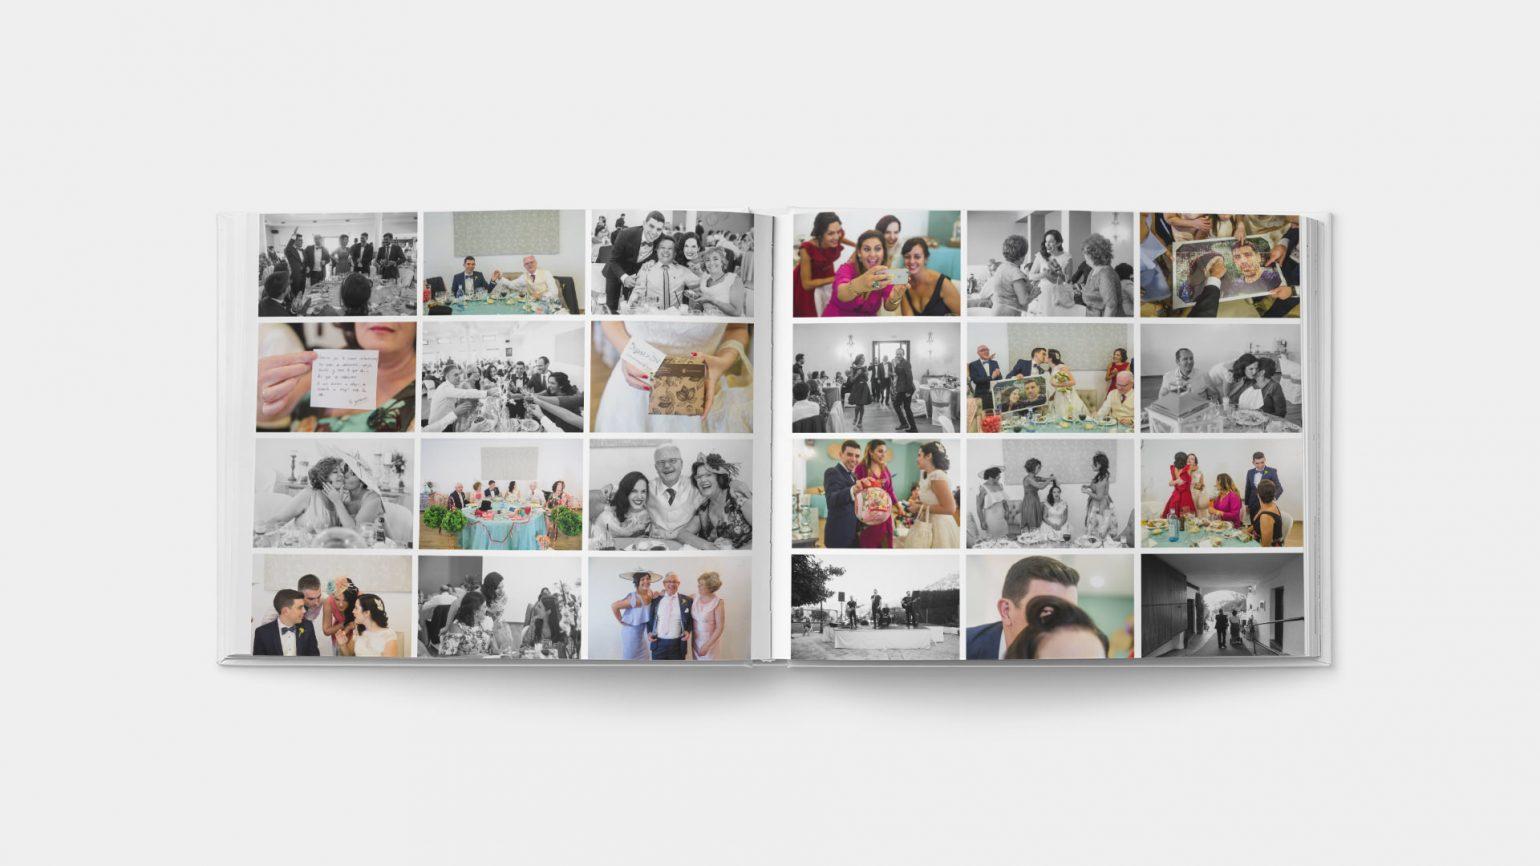 fotografo-boda-priego-cordoba-47